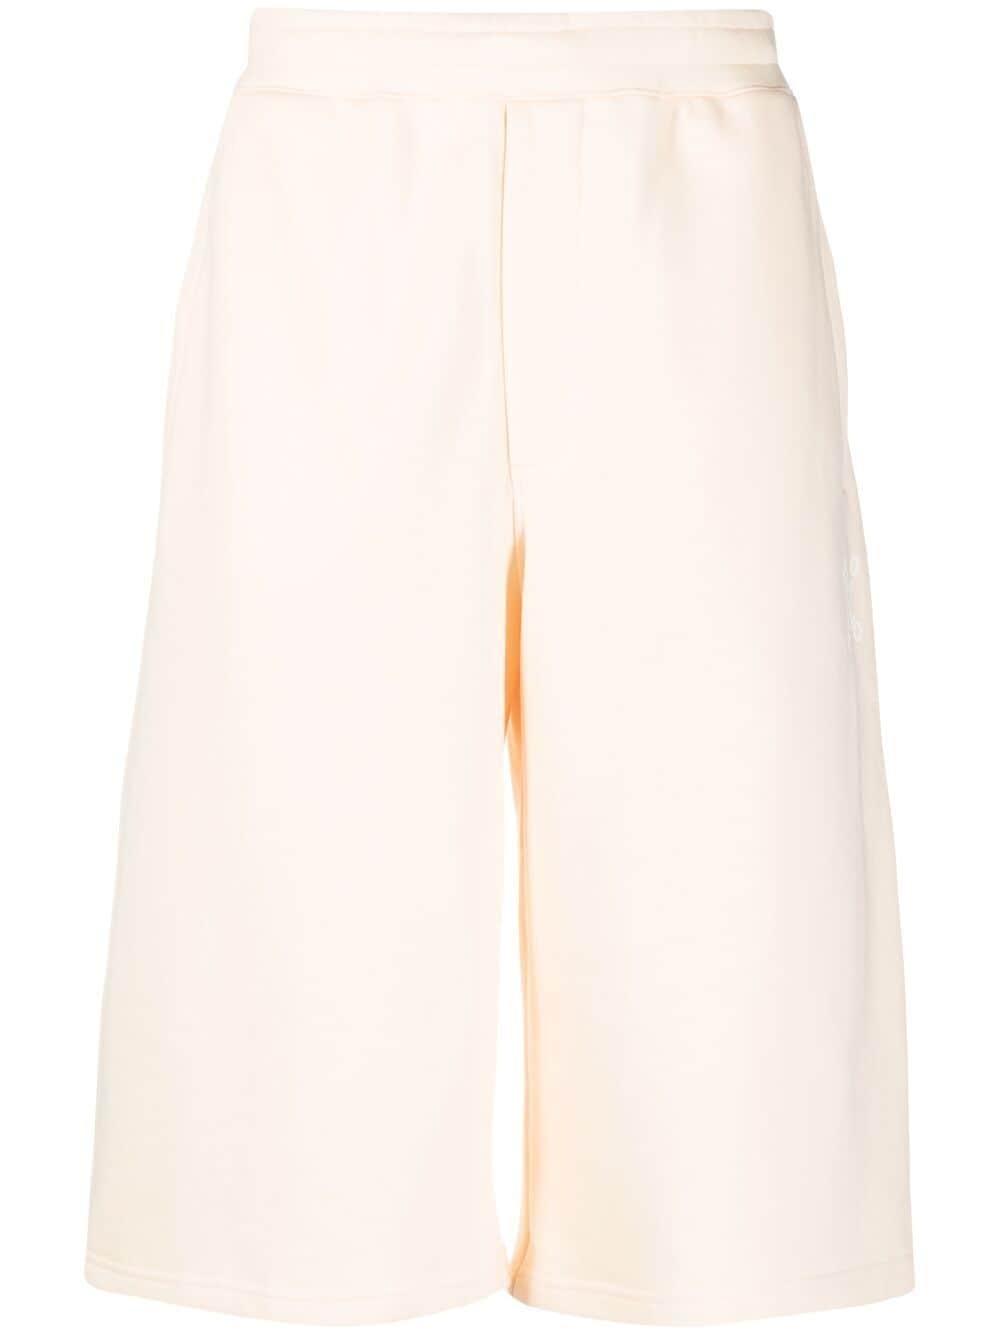 Kenzo knee-length track shorts - Nude